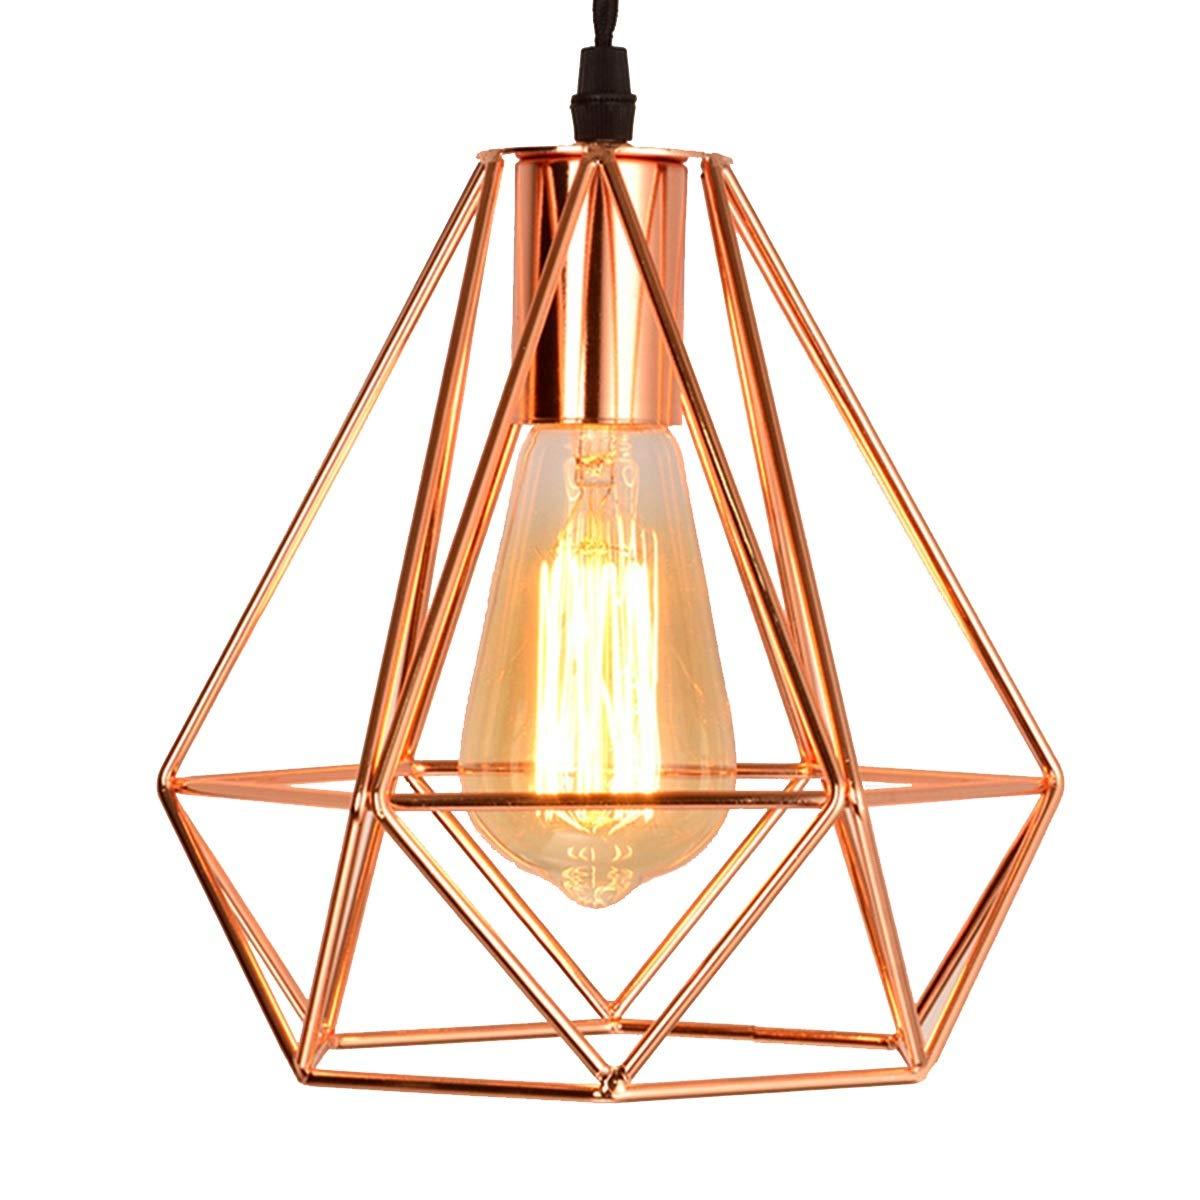 NANGE Modern Chandelier,Personality Plating Rose Gold Pendant Lights,Kitchen Island Table Dining Room Bedroom Entryway Hanging Lamp,E27(Without Light Source) (Color : AC 110V, Size : Gold) by NANGE (Image #3)